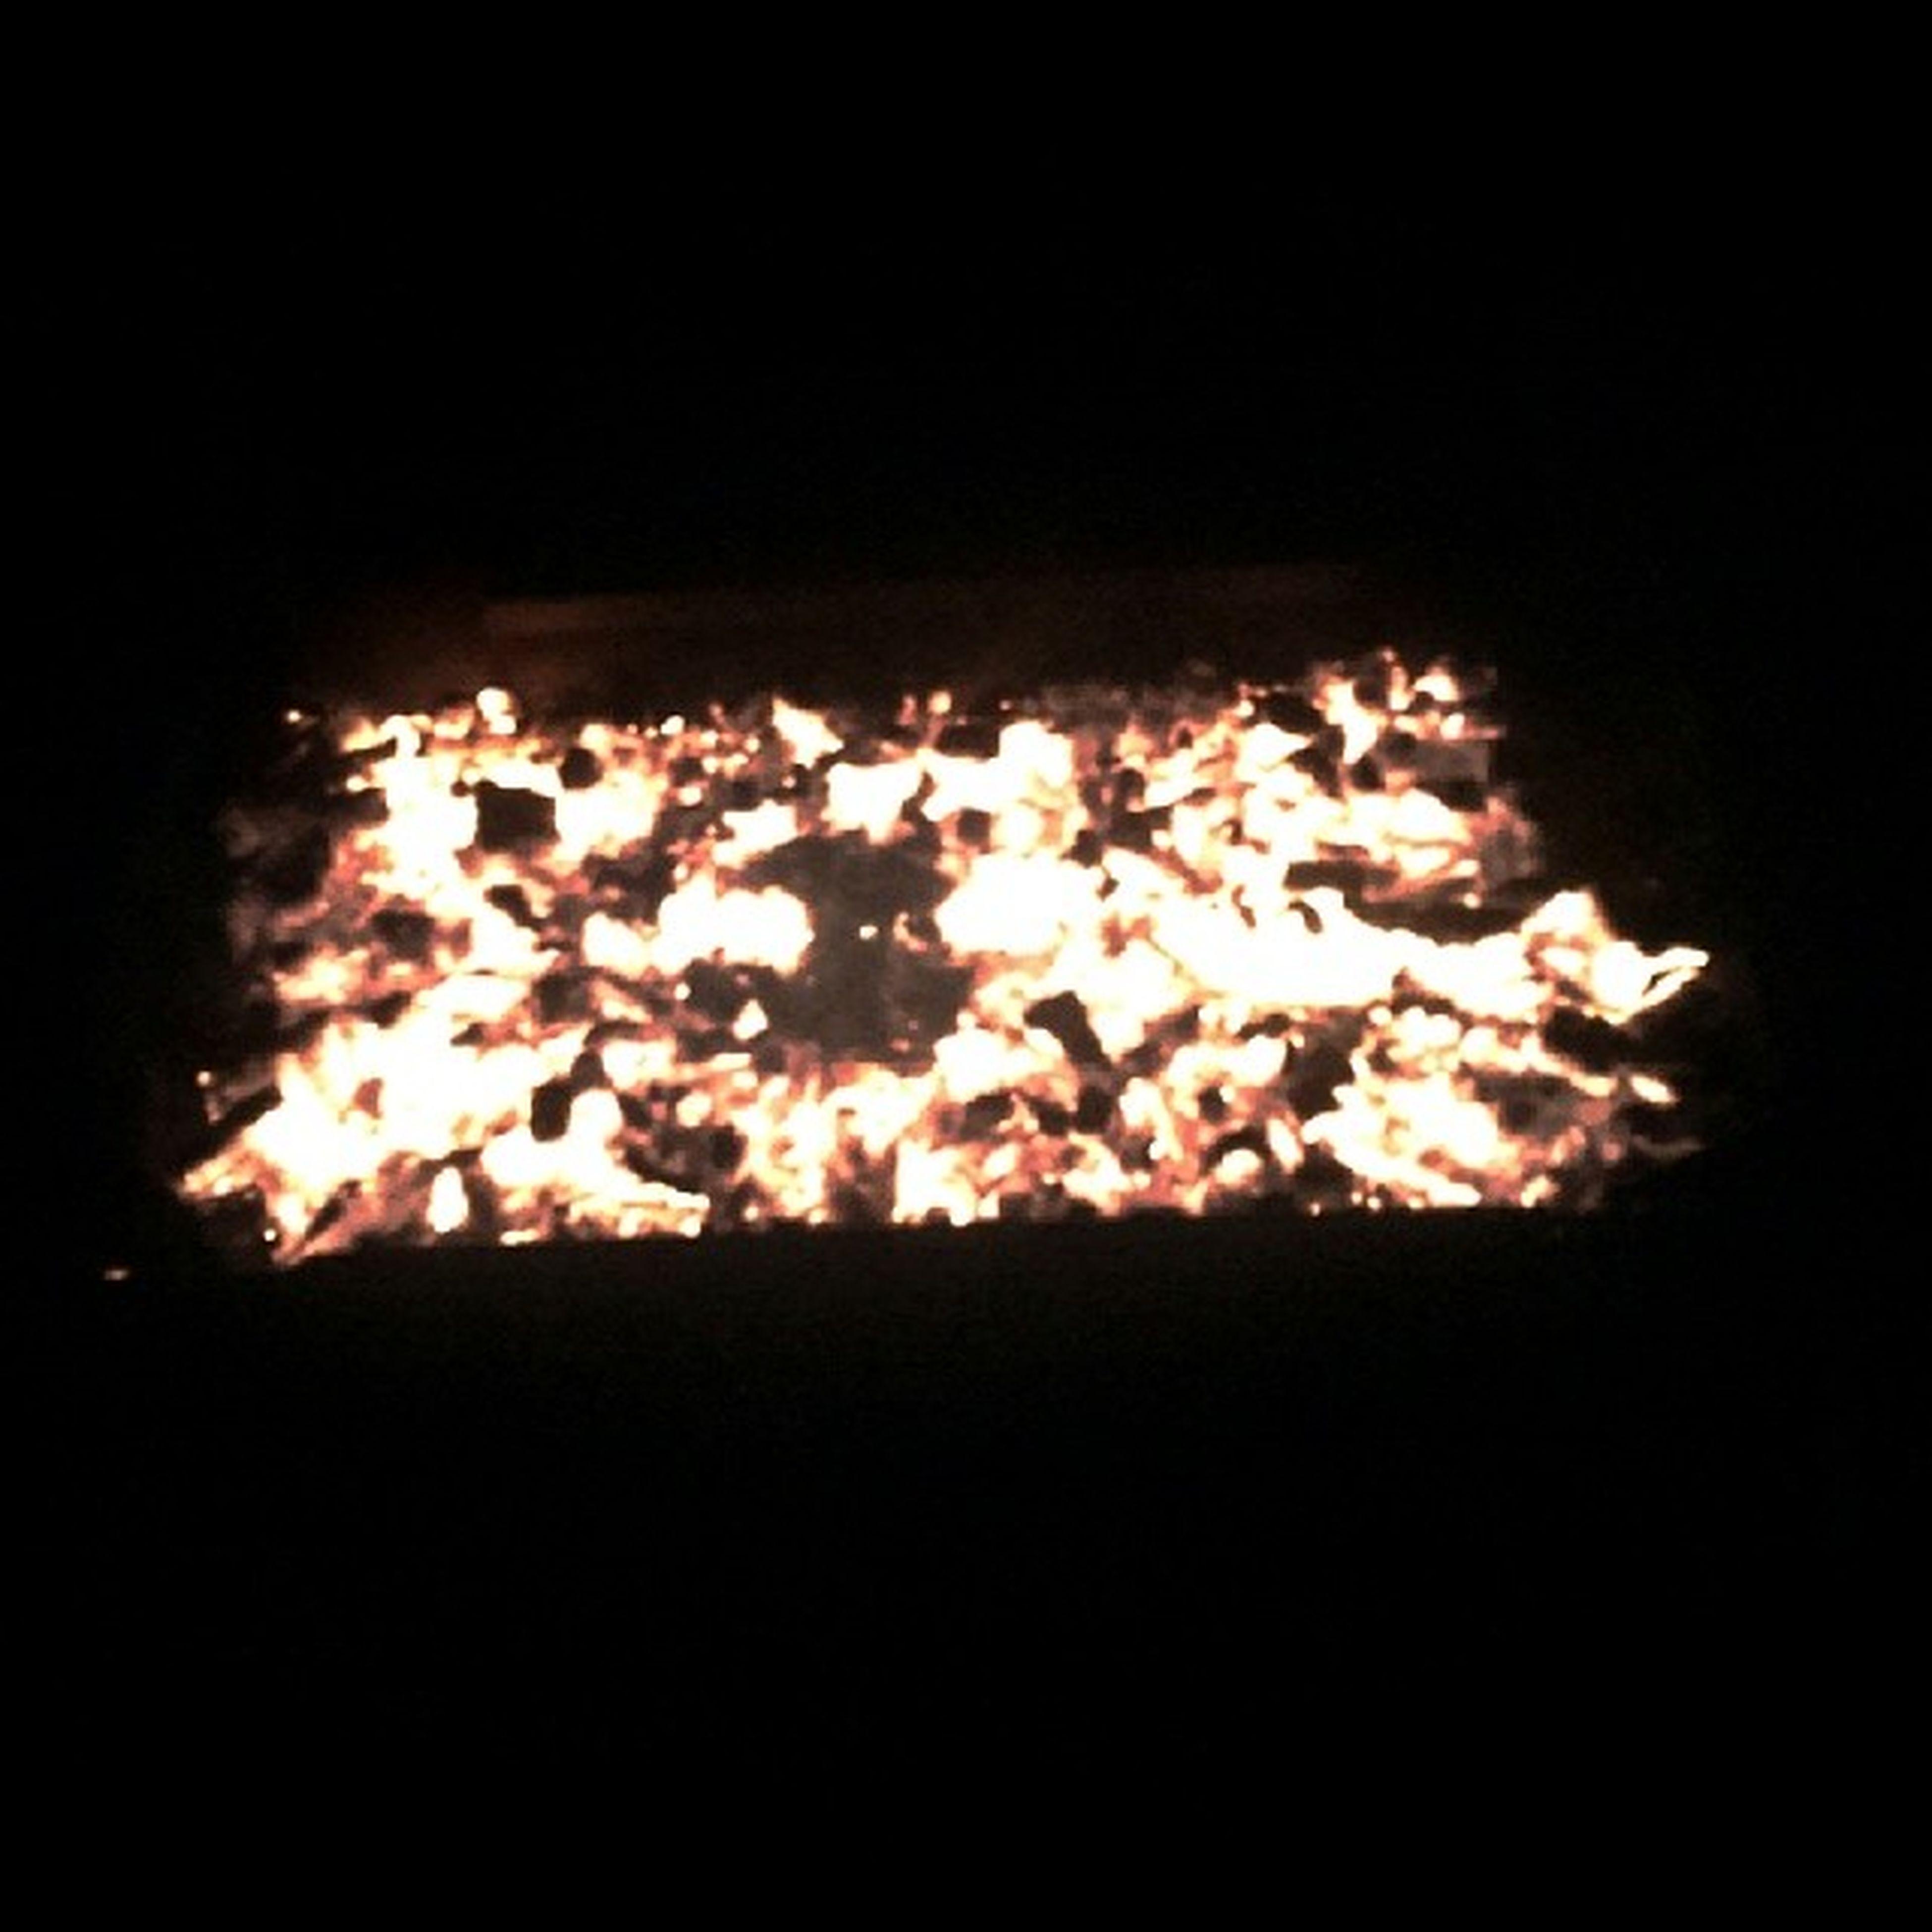 Glowing coals >:) Fire Coals Bonefire Glowingcoals ColdNight Pyro Pyroproblems